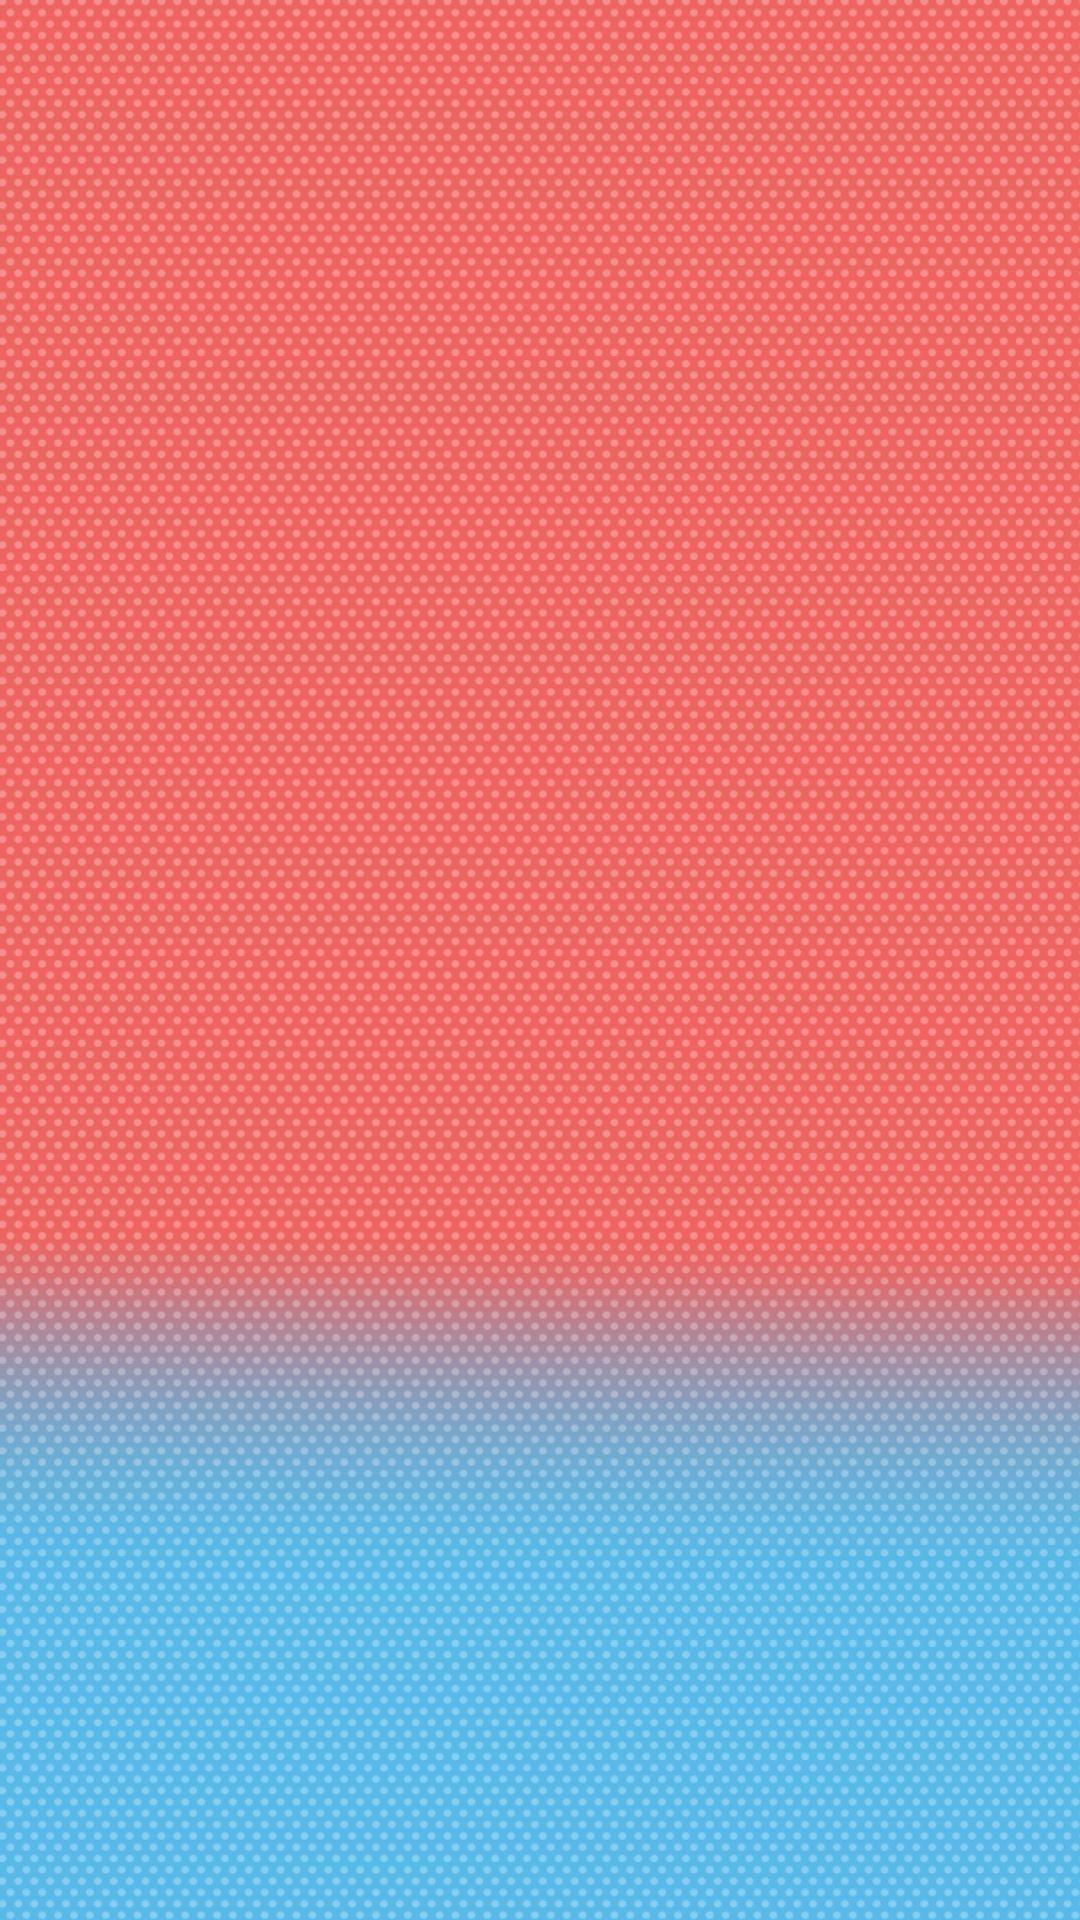 The iPhone Retina Wallpaper I like! Stunning wallpapers